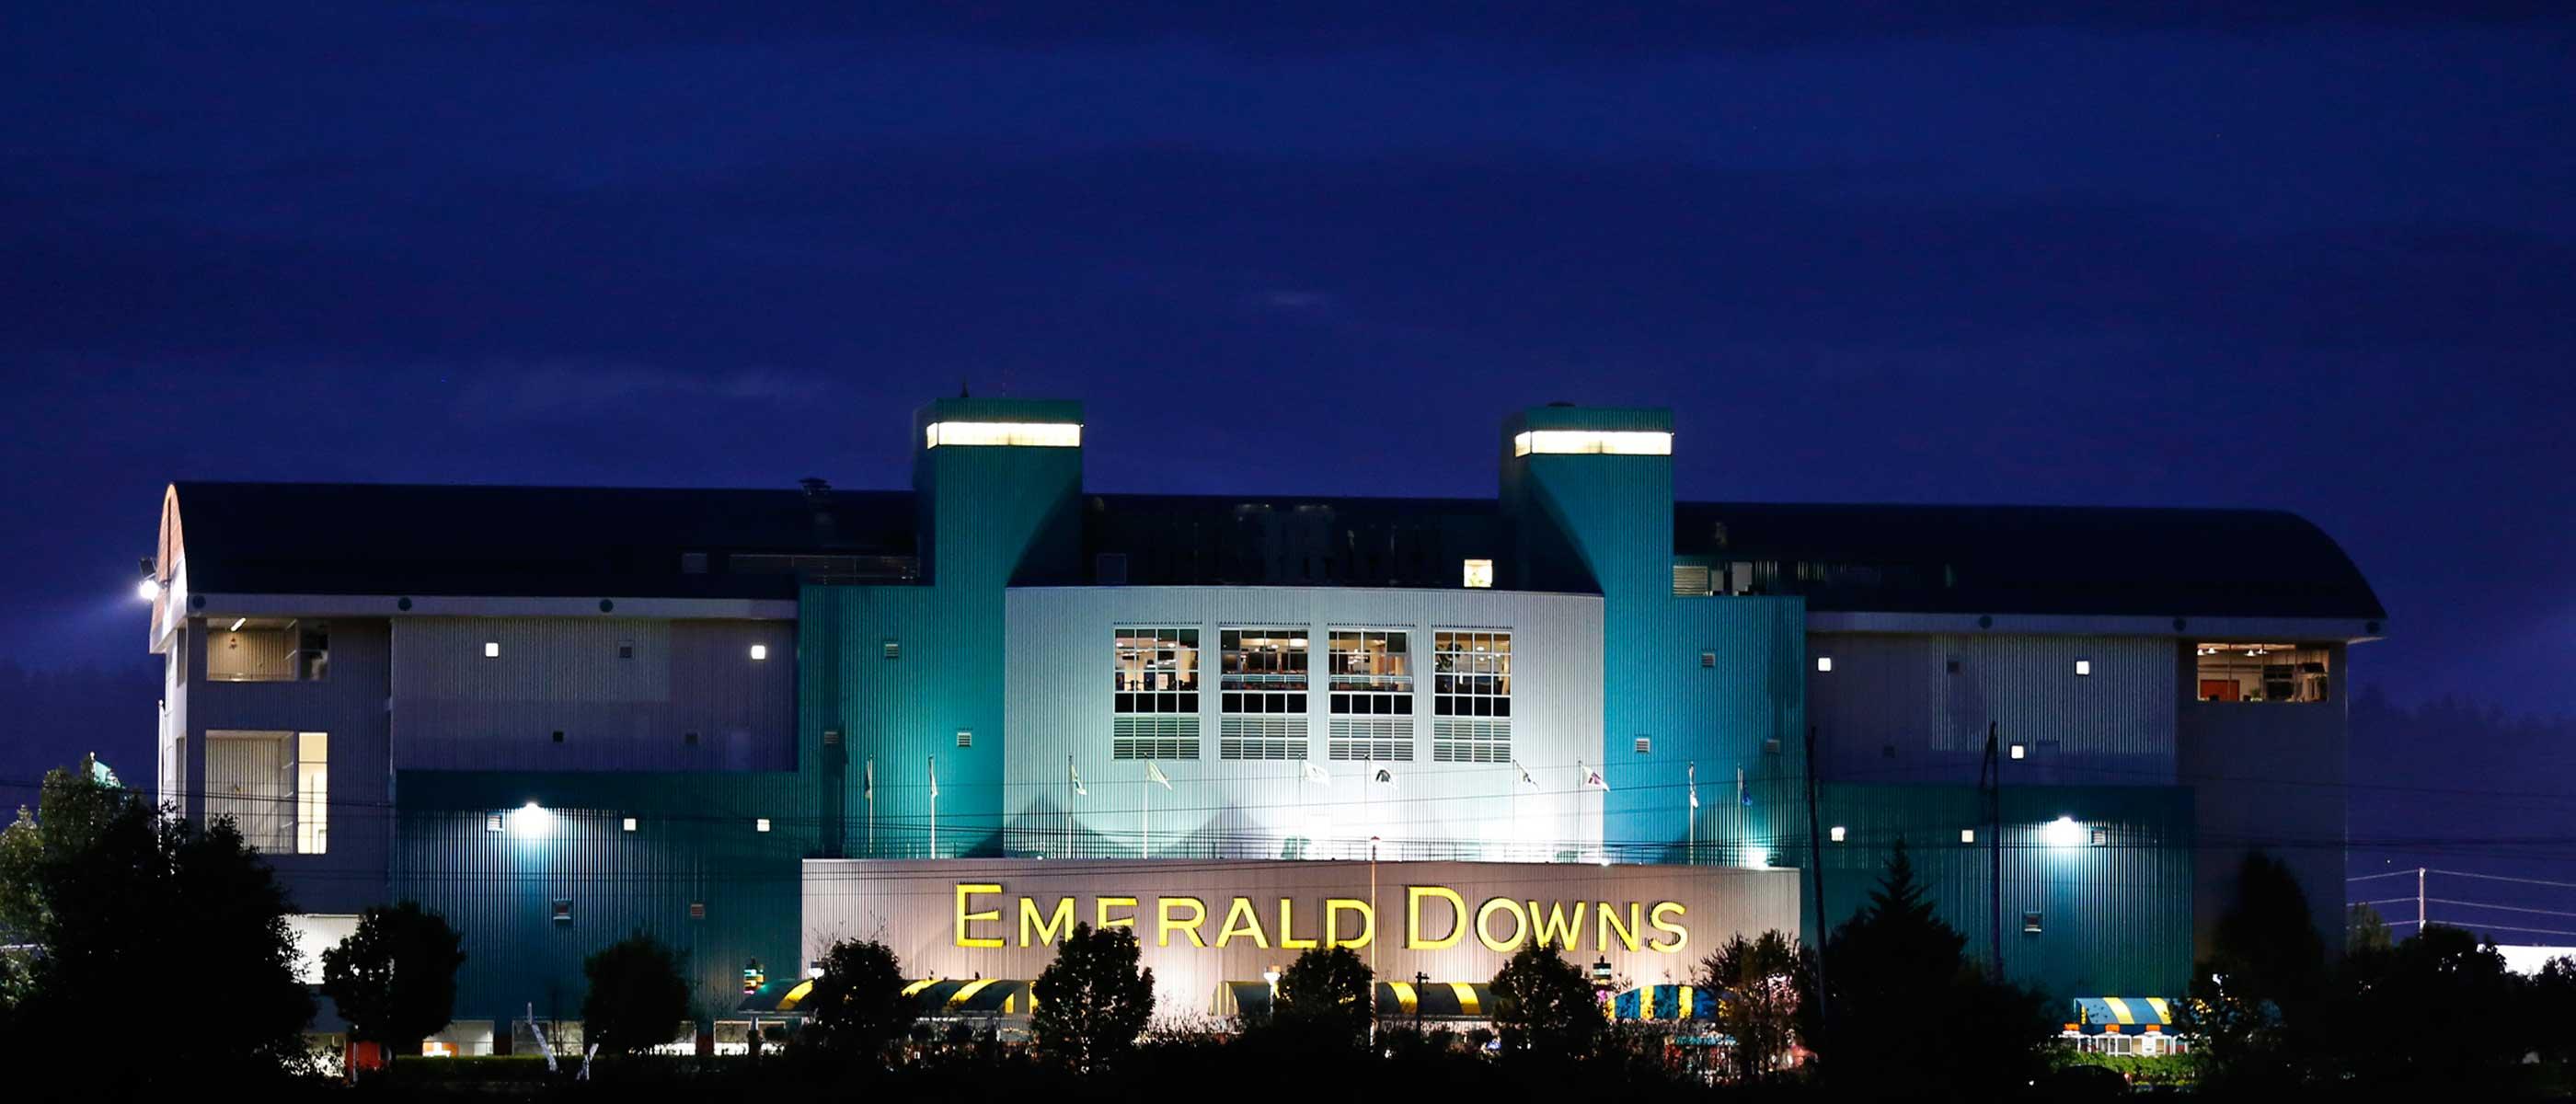 Emerald Downs Building Emerald Downs